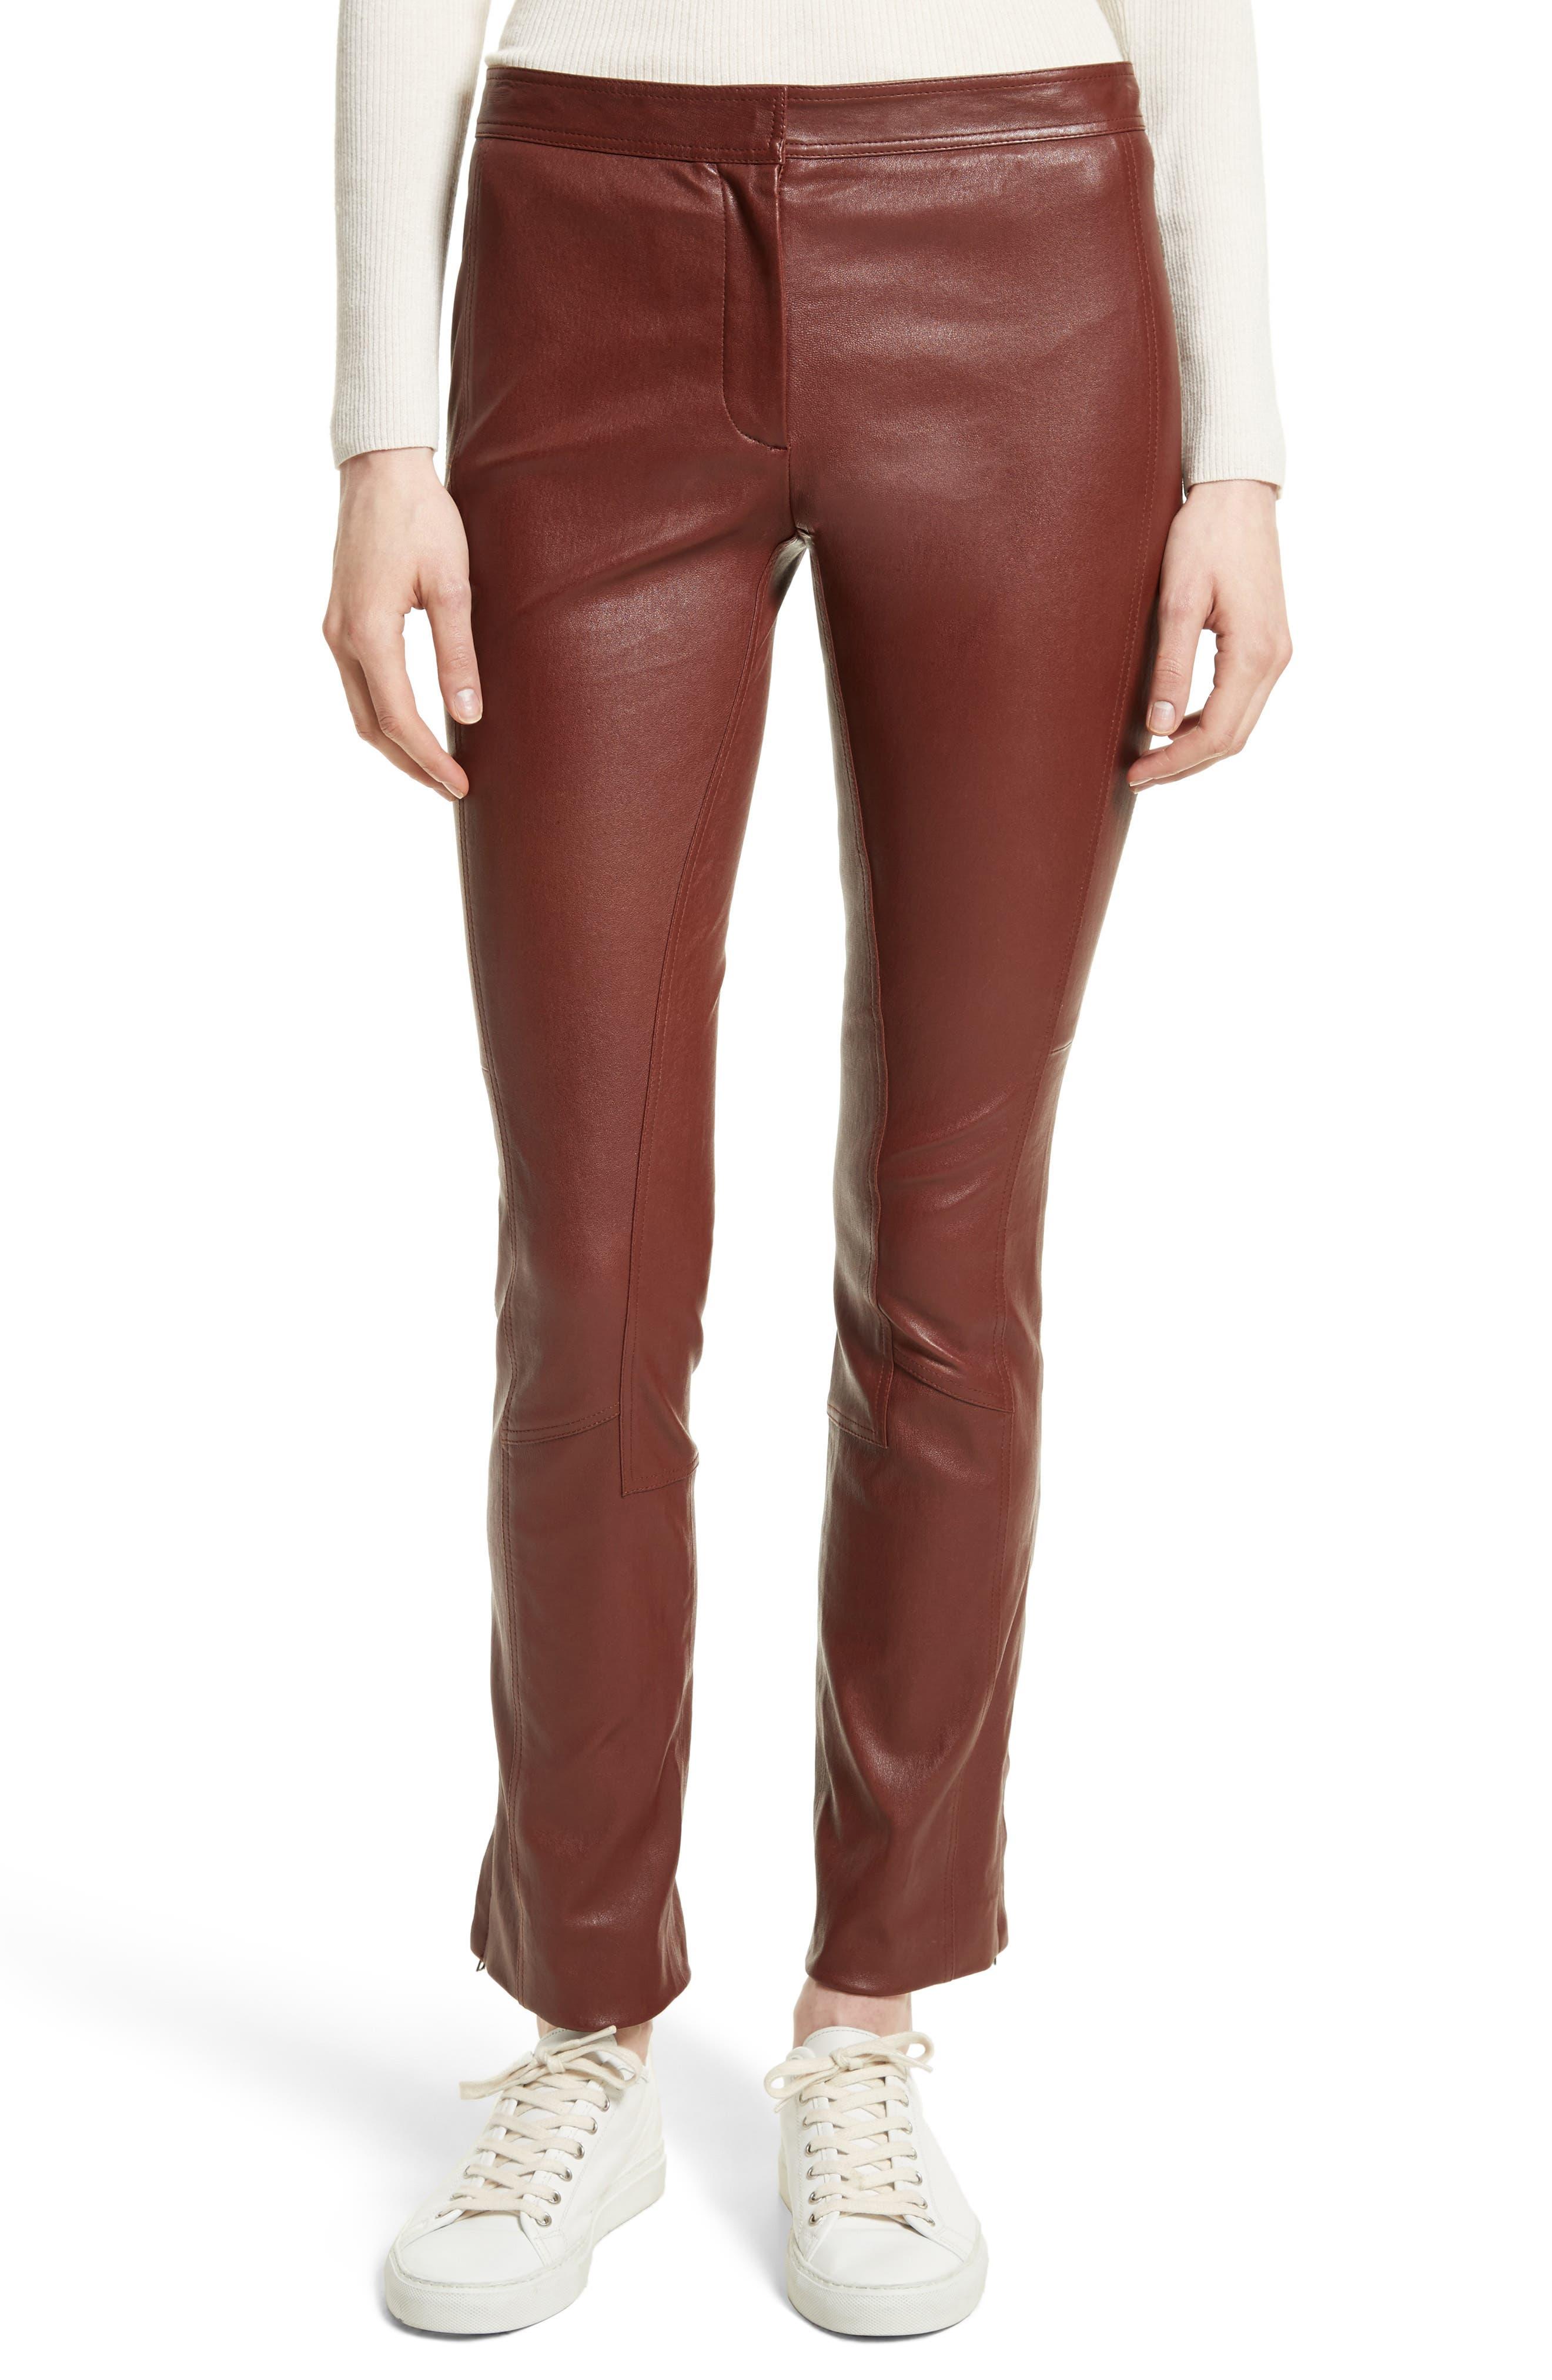 Bristol Leather Riding Pants,                             Main thumbnail 1, color,                             215